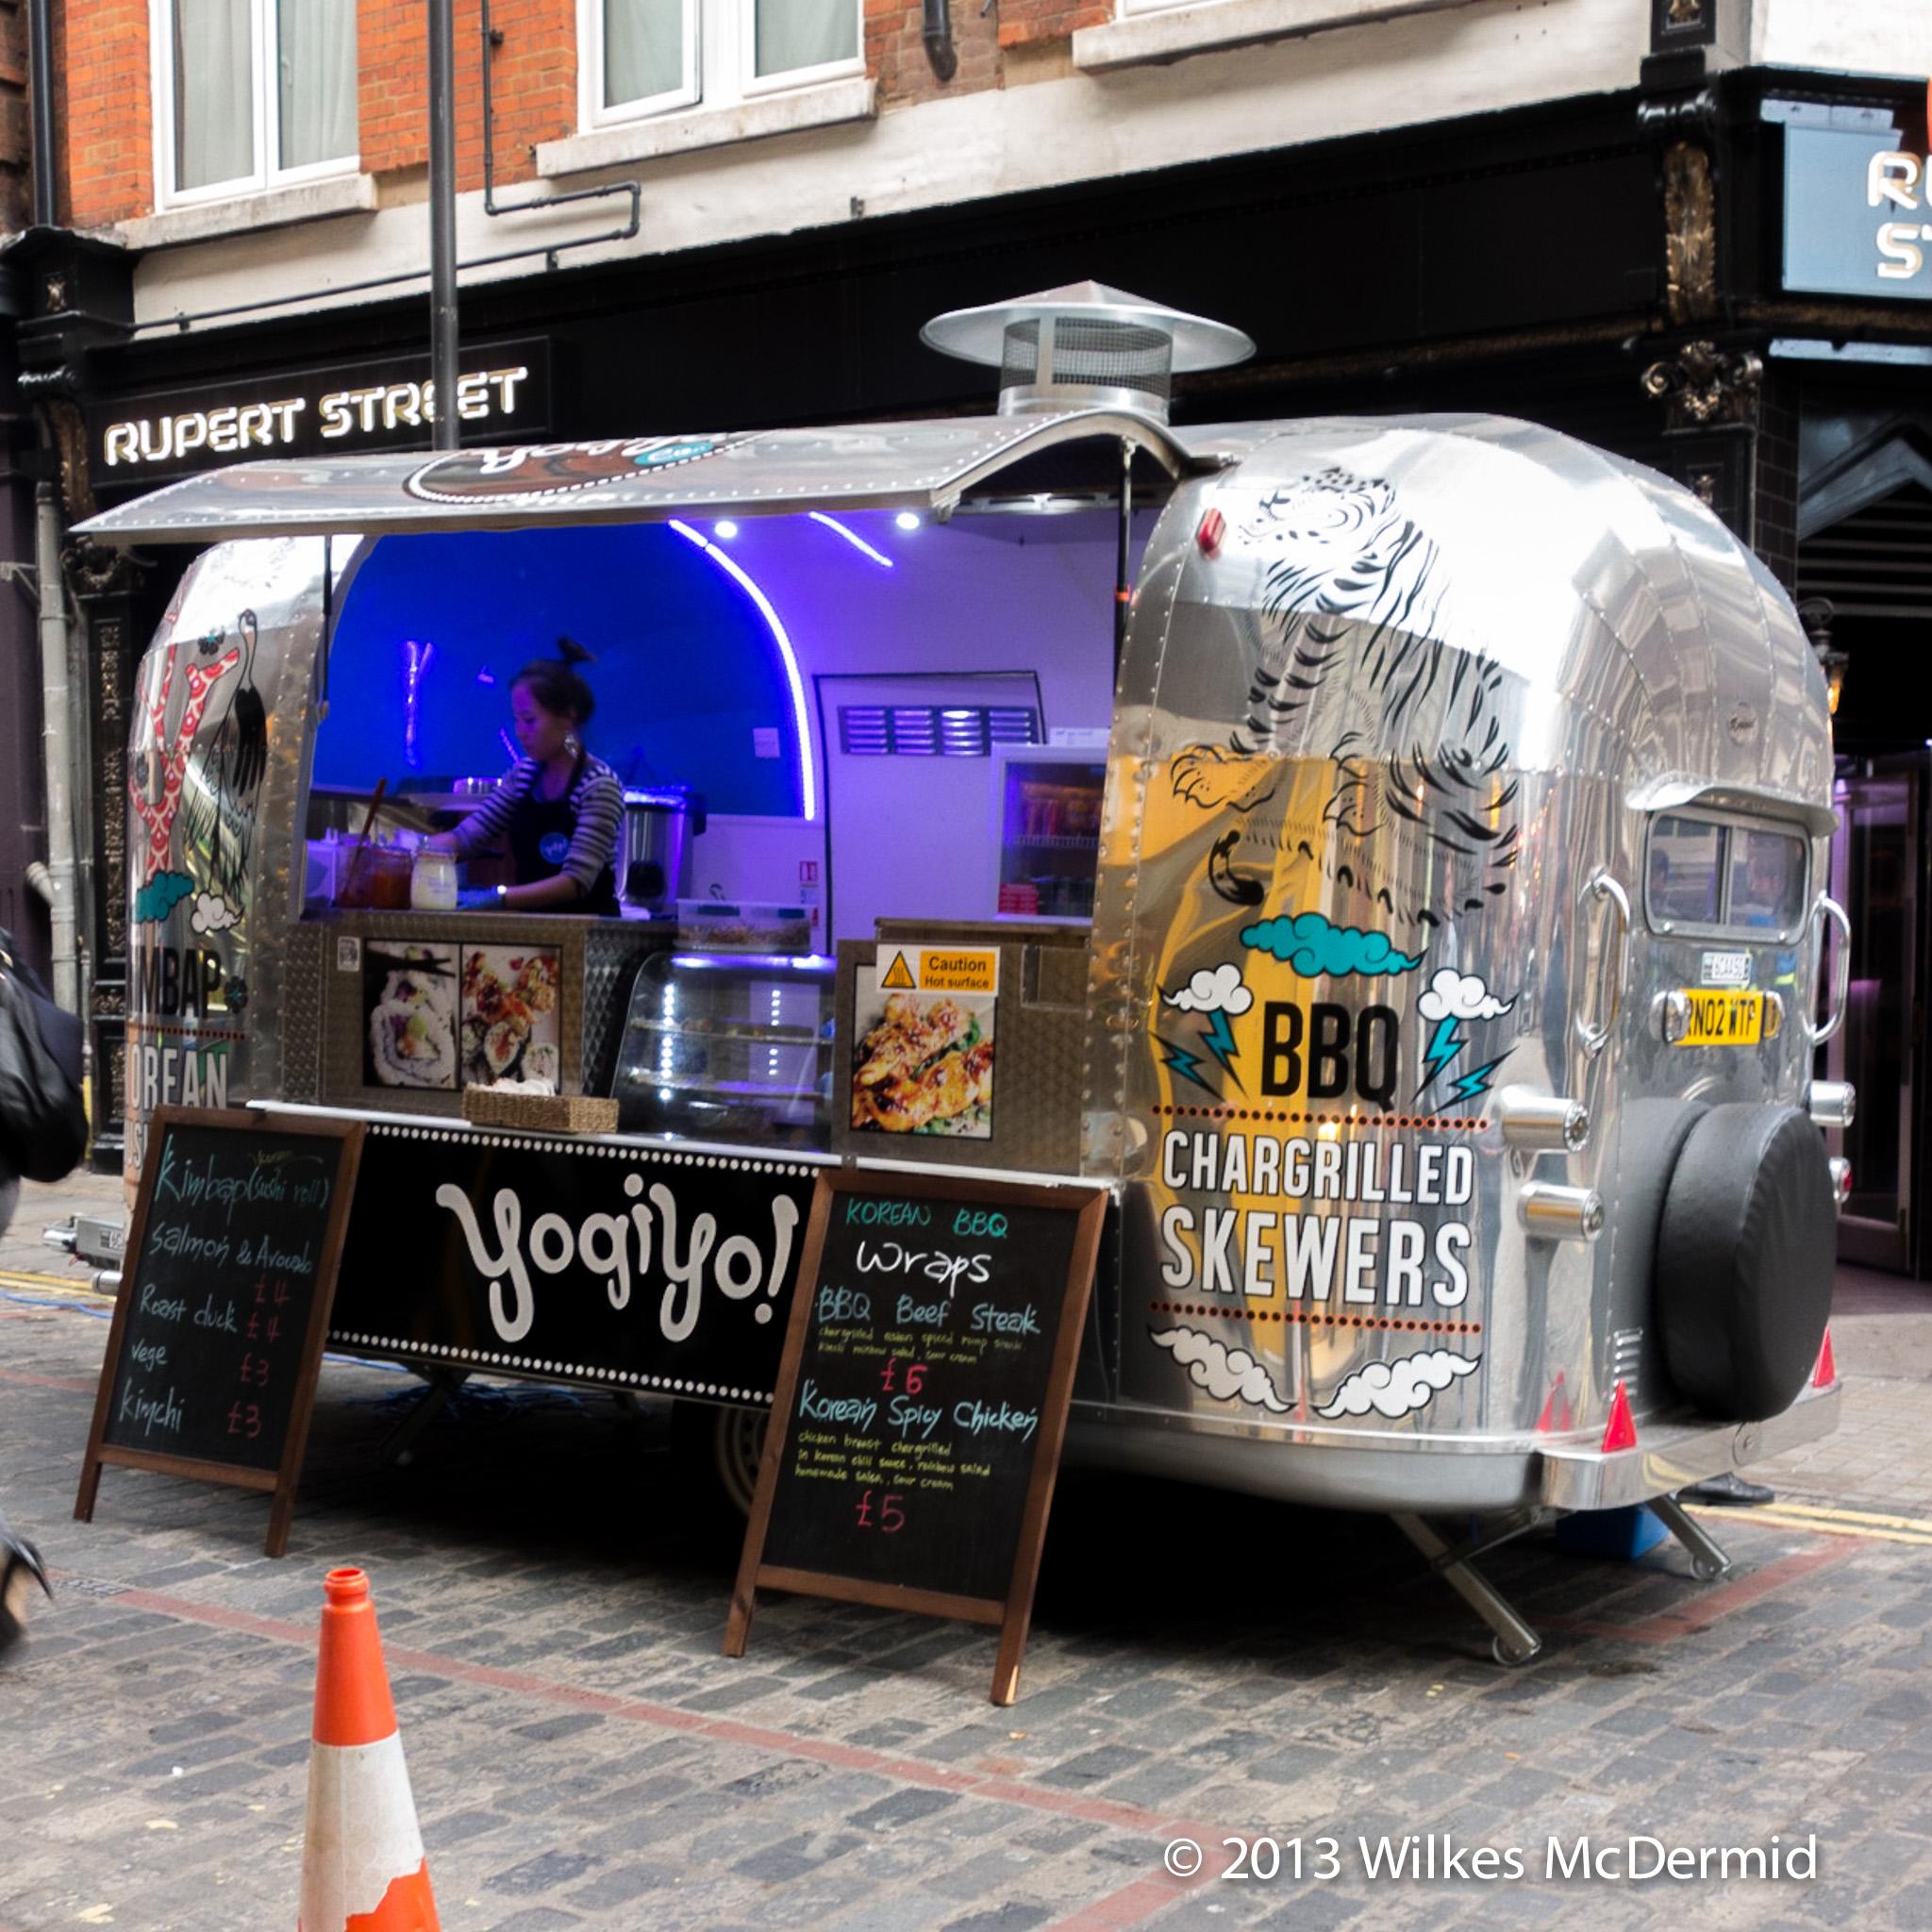 Street Food Union – Yogoyo… Shiny!